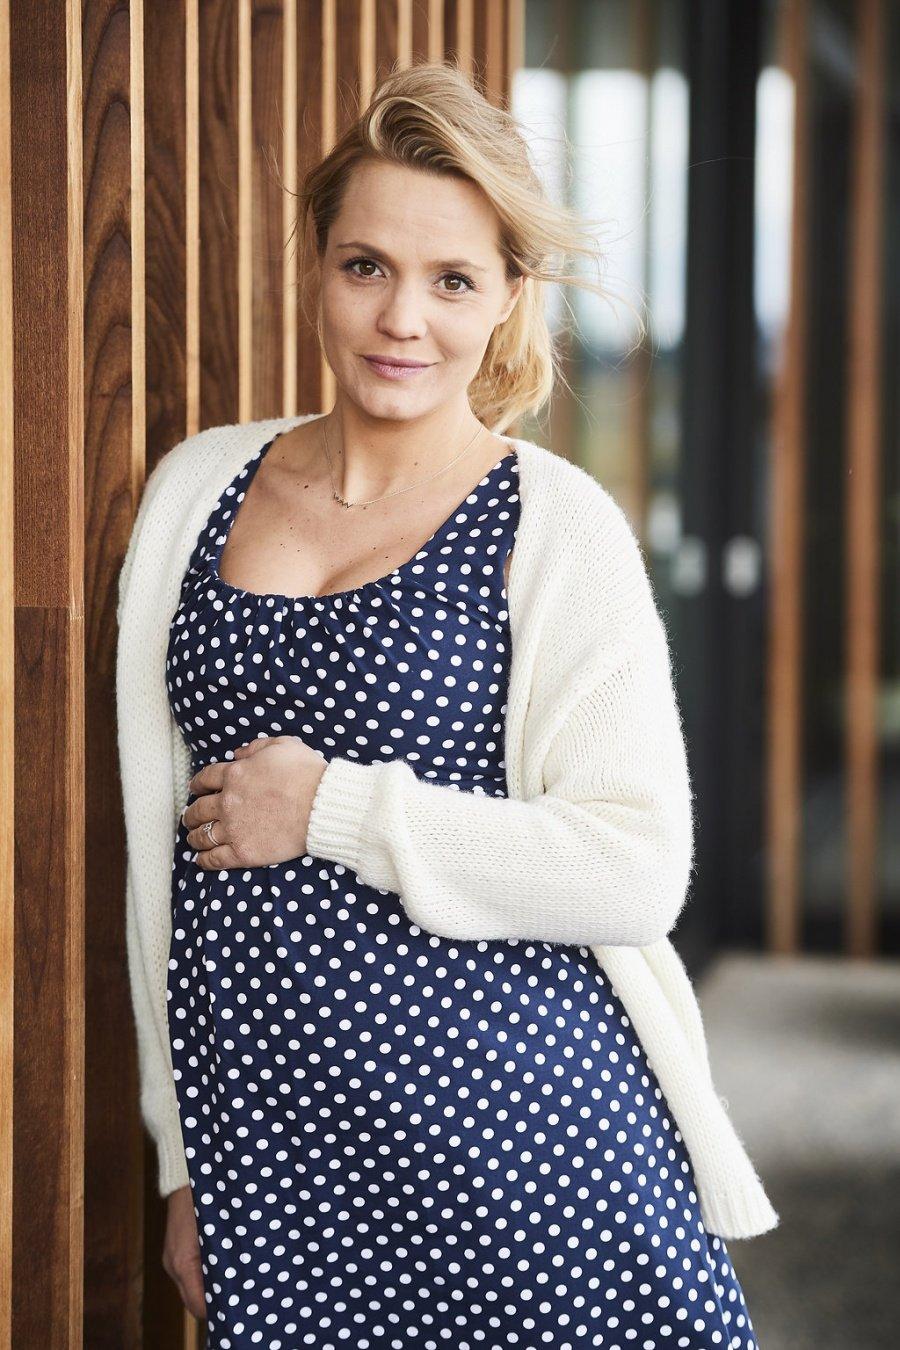 Zwangerschapskleding Verkopen.Prive Verkoop Zwangerschapskleding In Gent Op 14 16 September